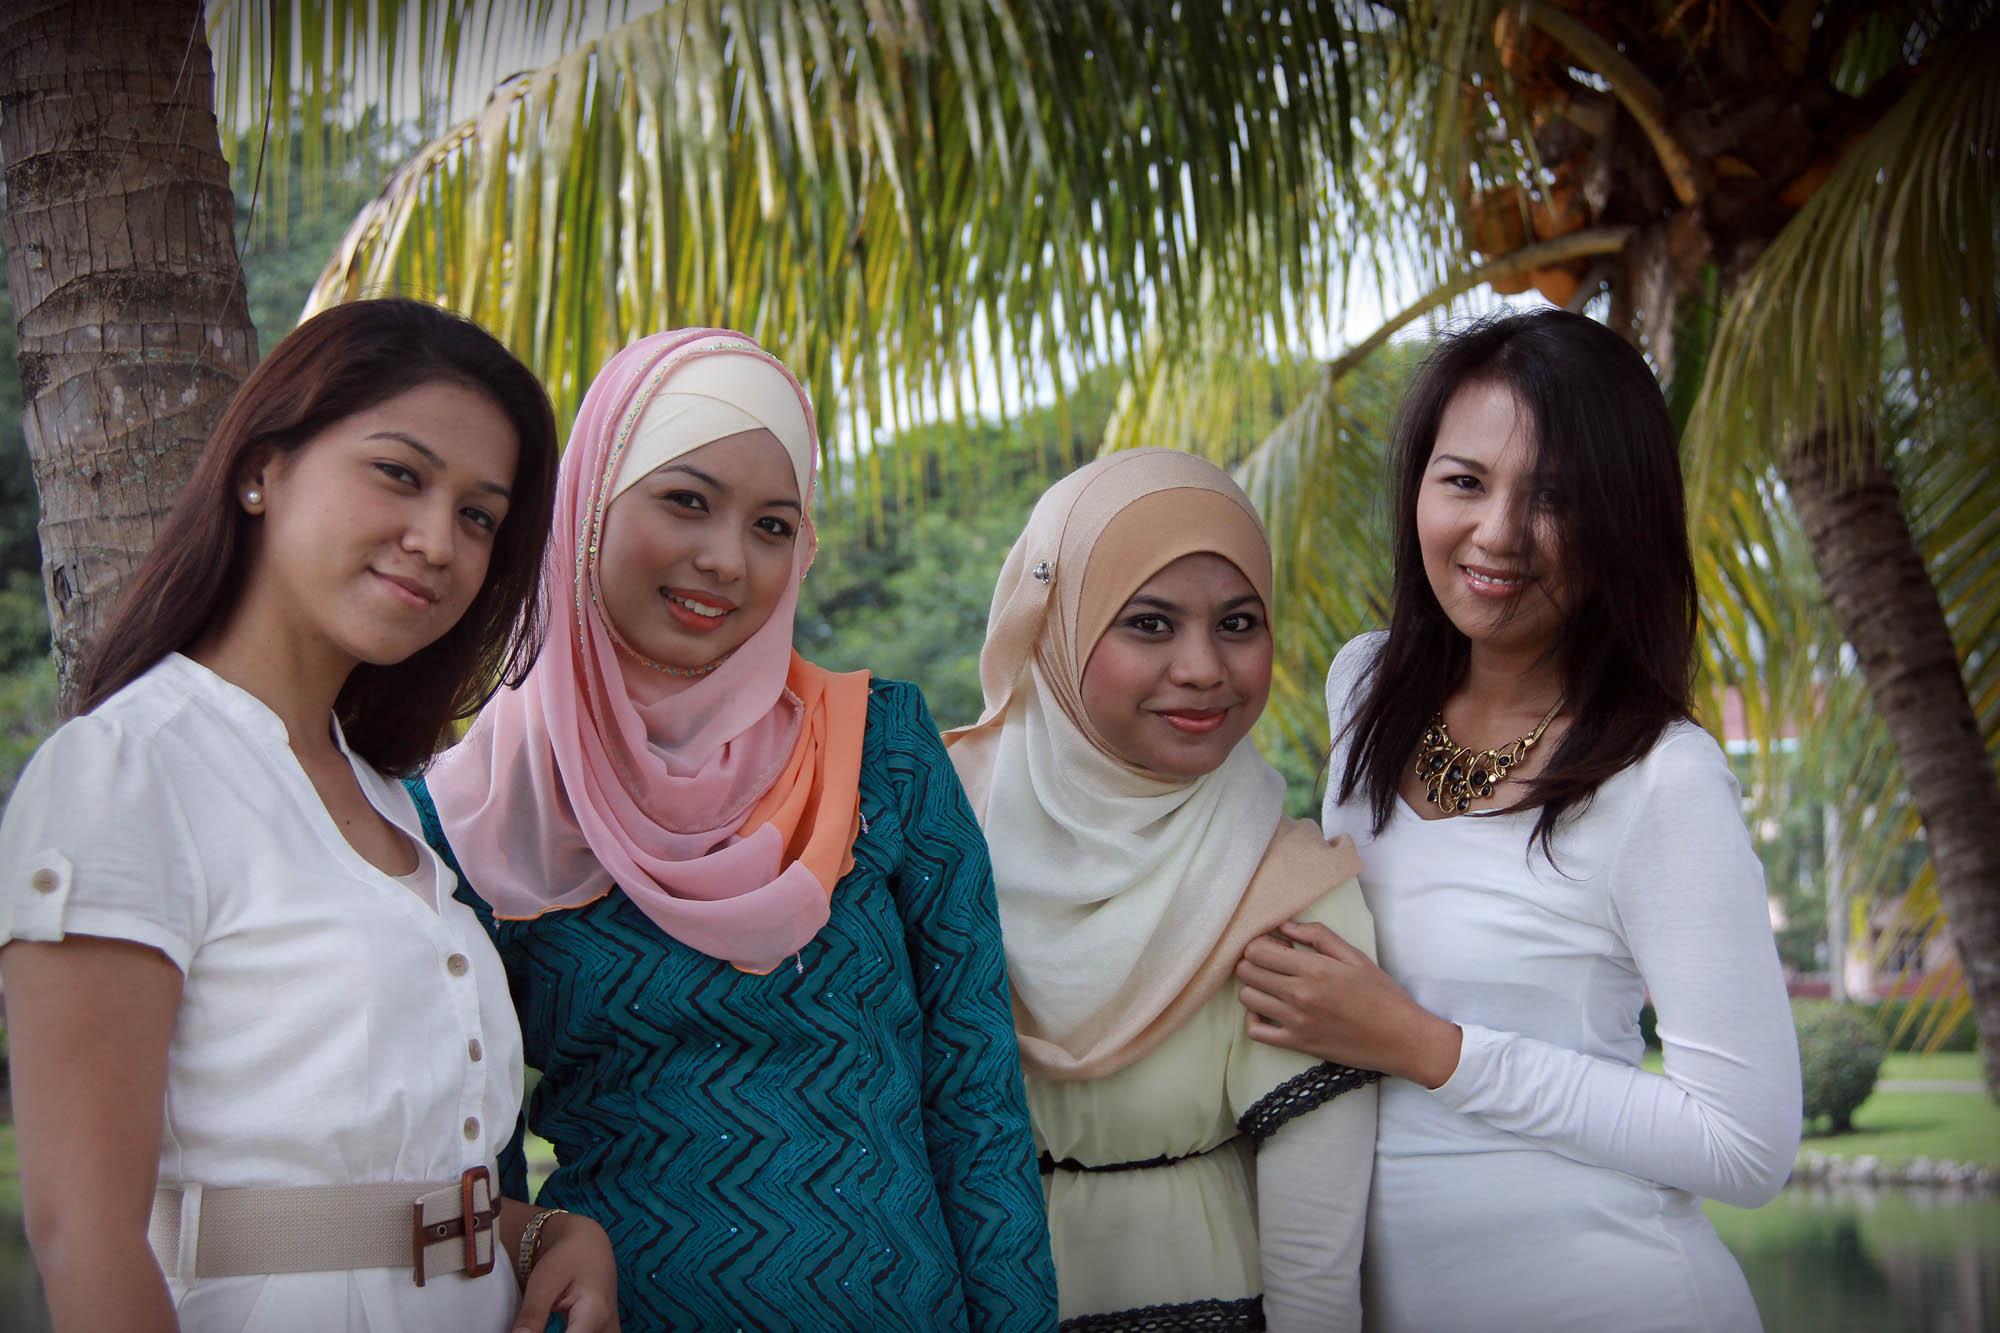 Nadia & Friends